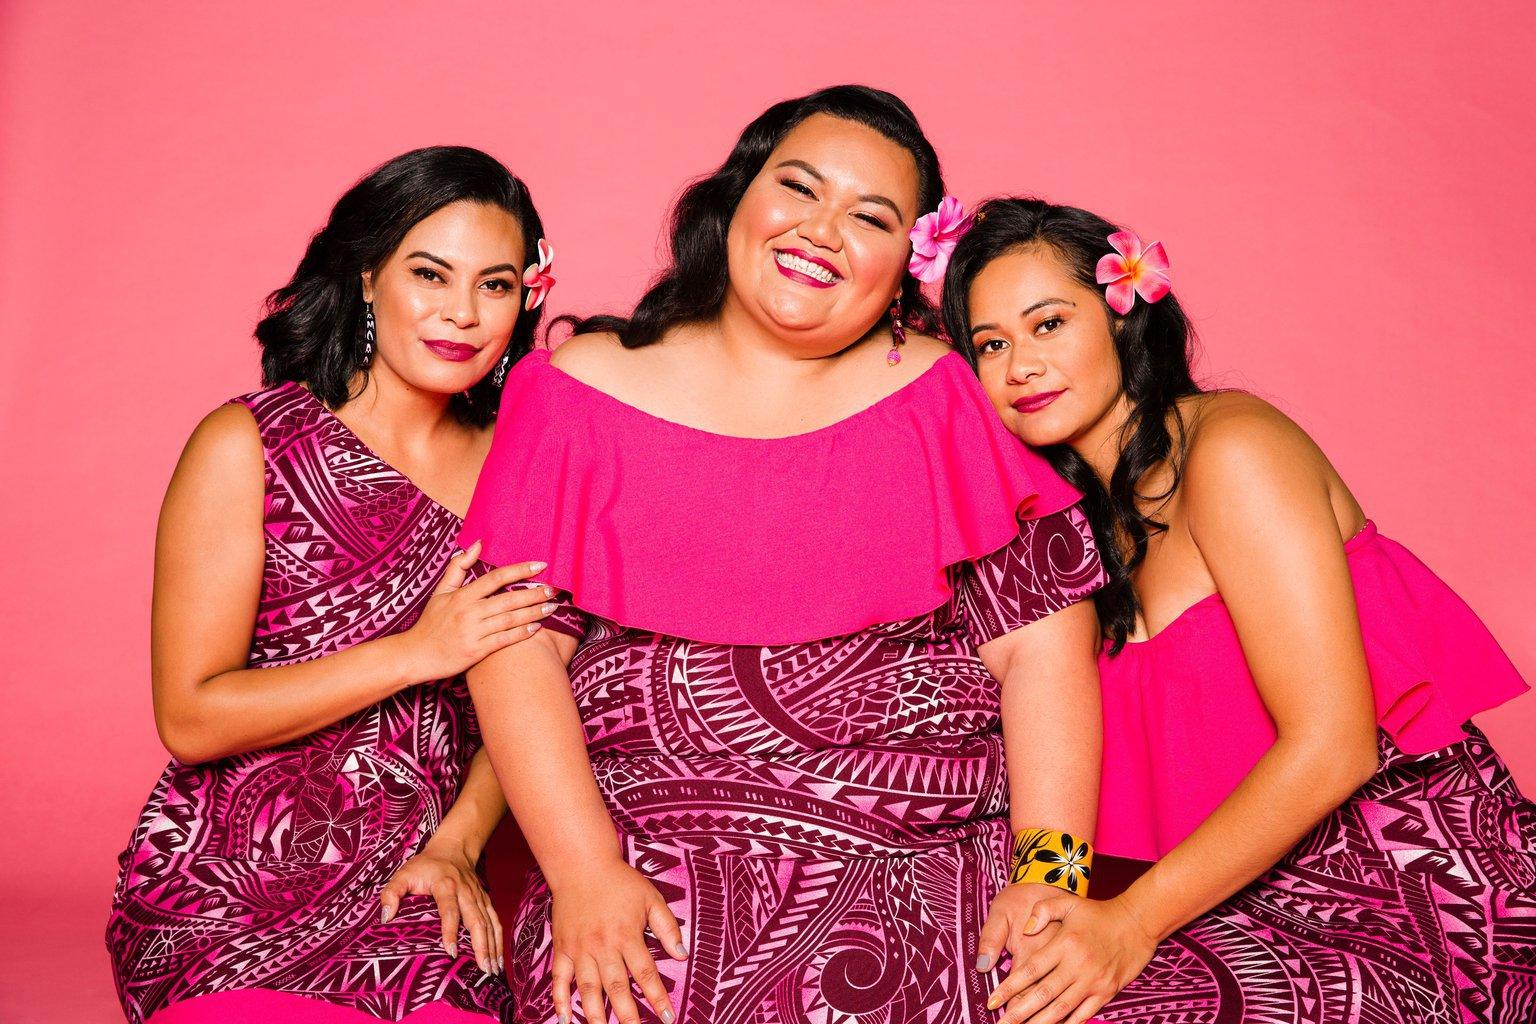 The cast of Sis the Show - Hillary Samuela, Gaby Solomona, Suivai Pilisipi Autagavaia